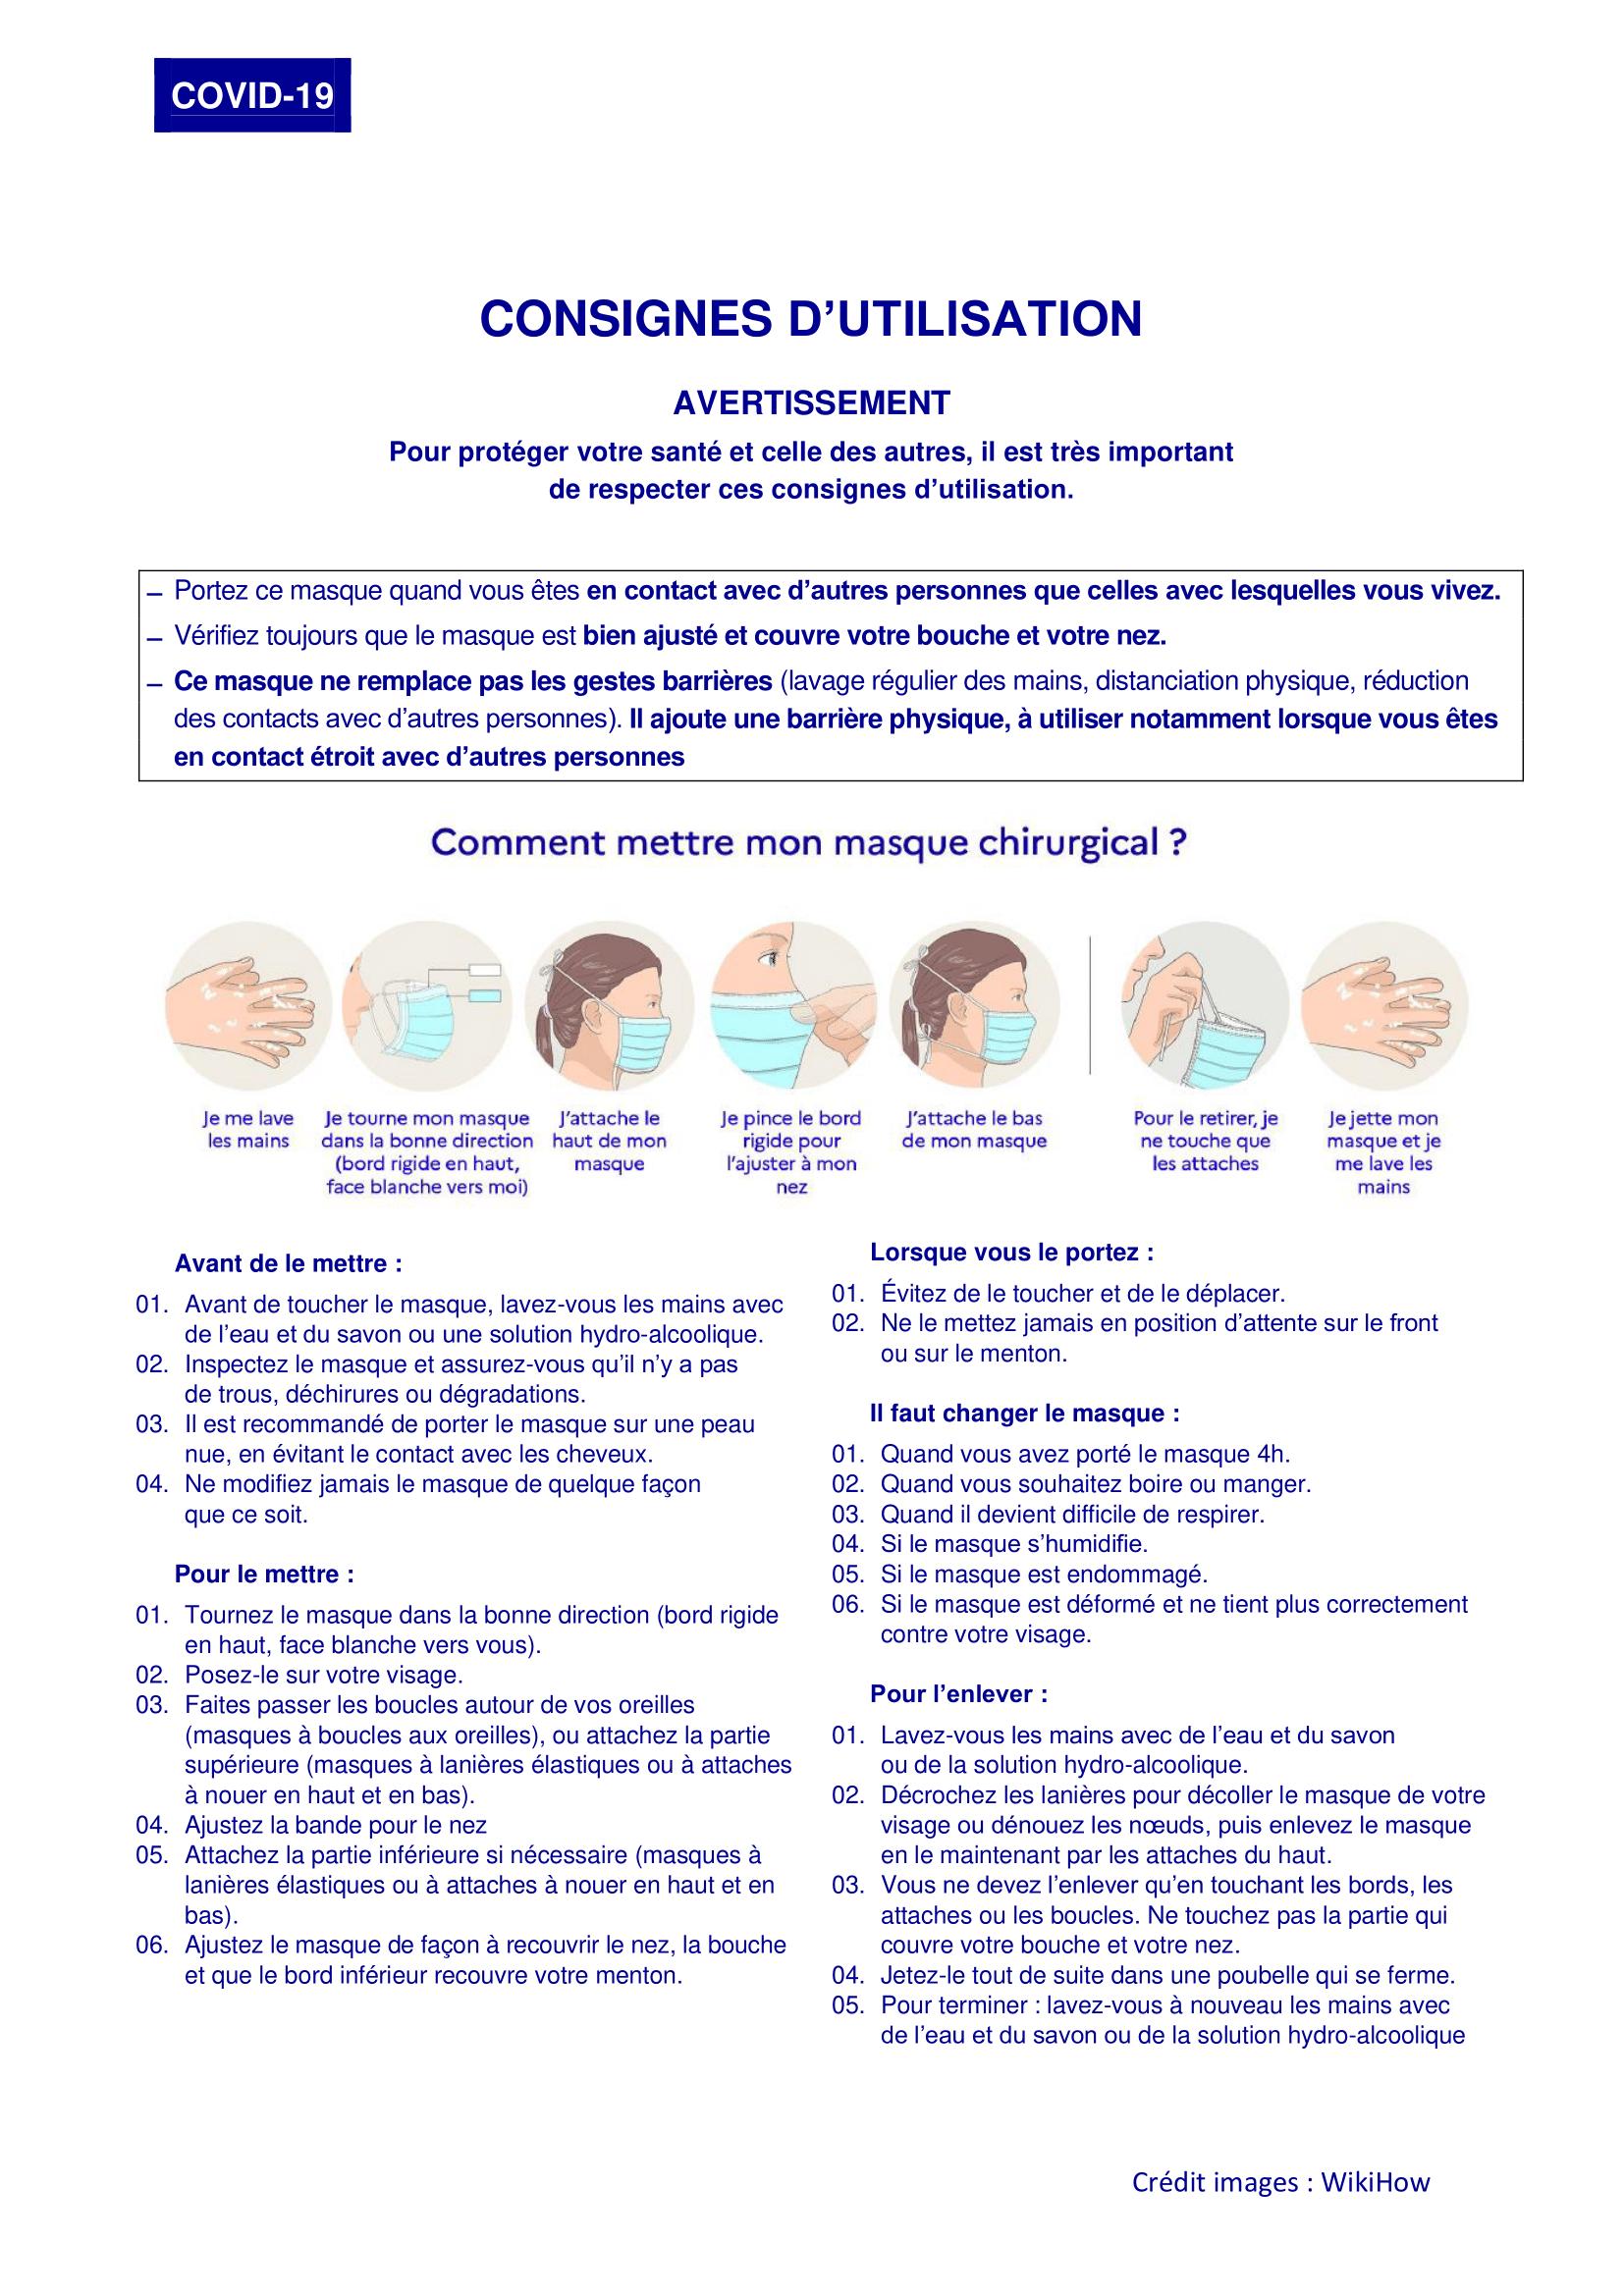 Consignes d'utilisation du masque chirurgical